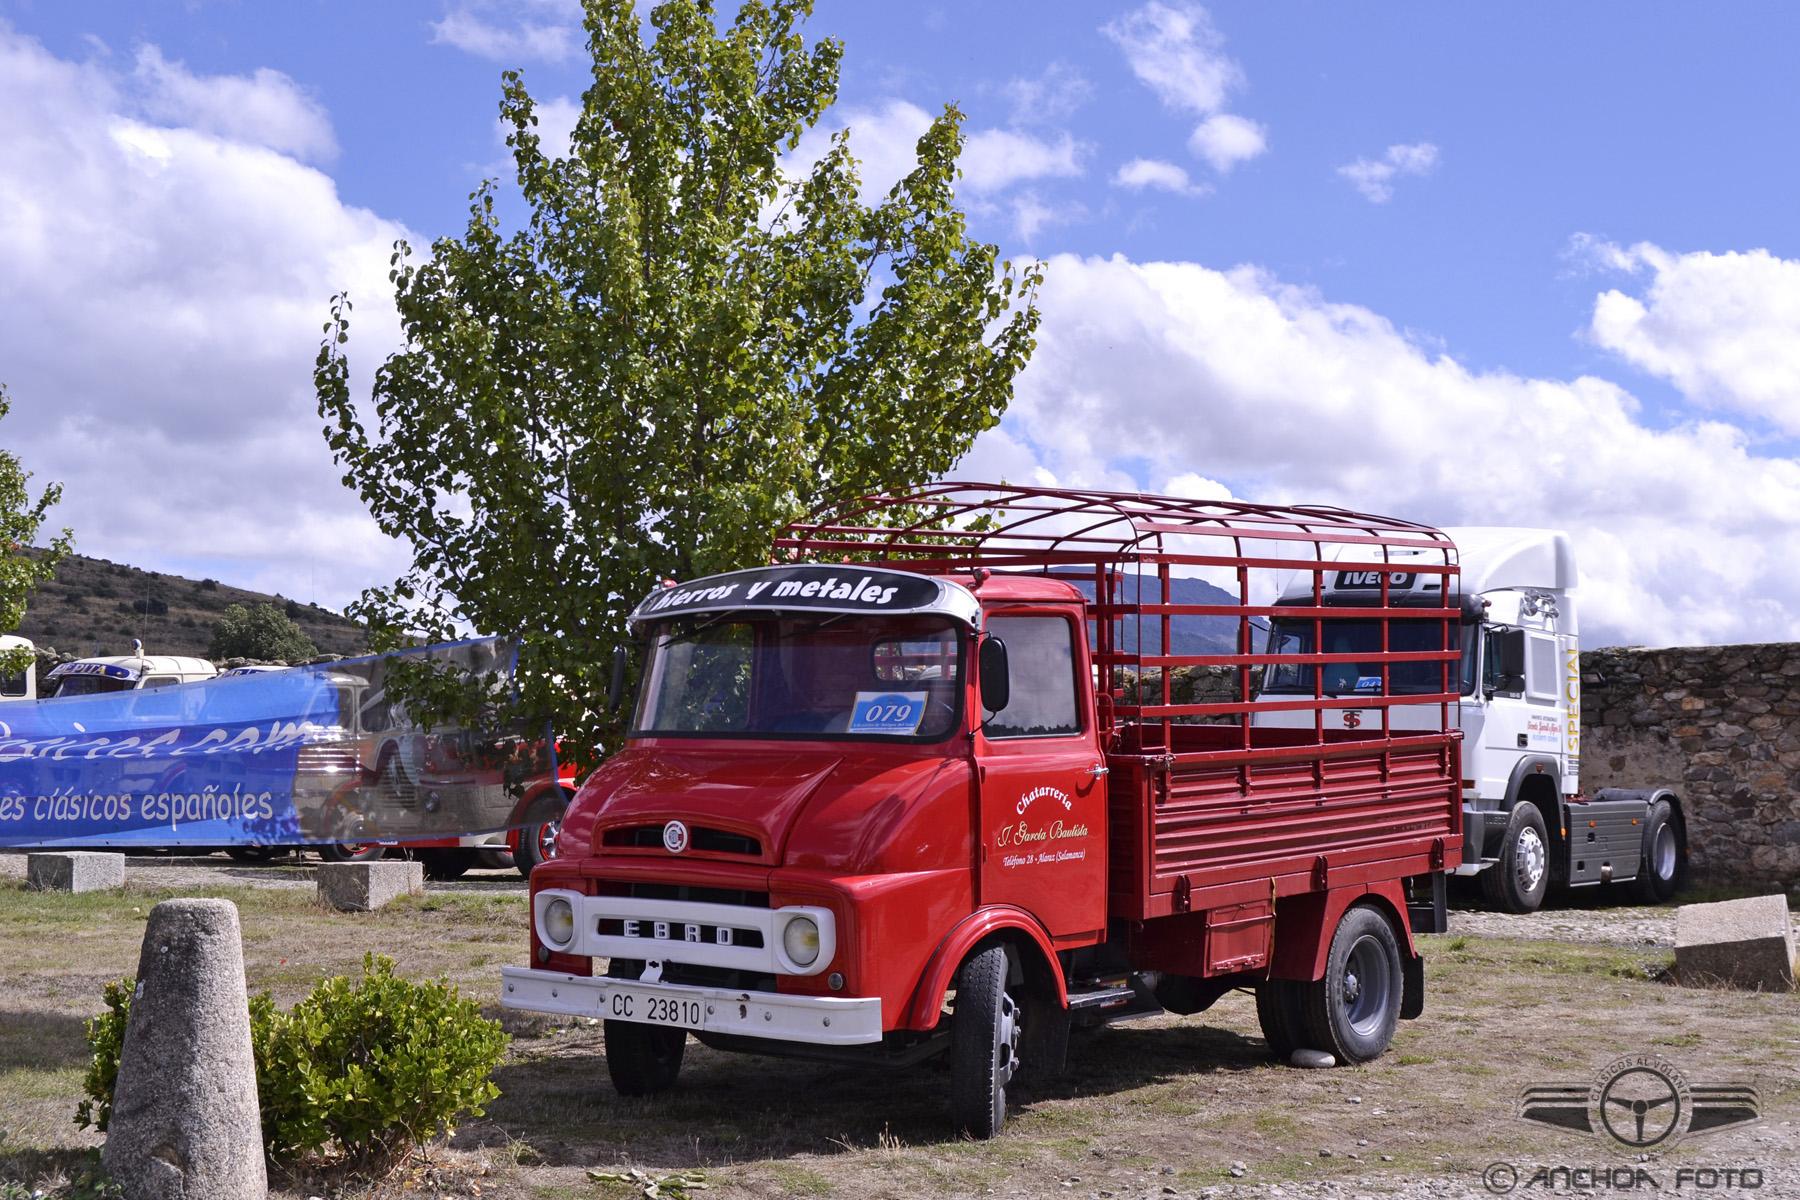 Camion antiguo Ebro C-150 1968